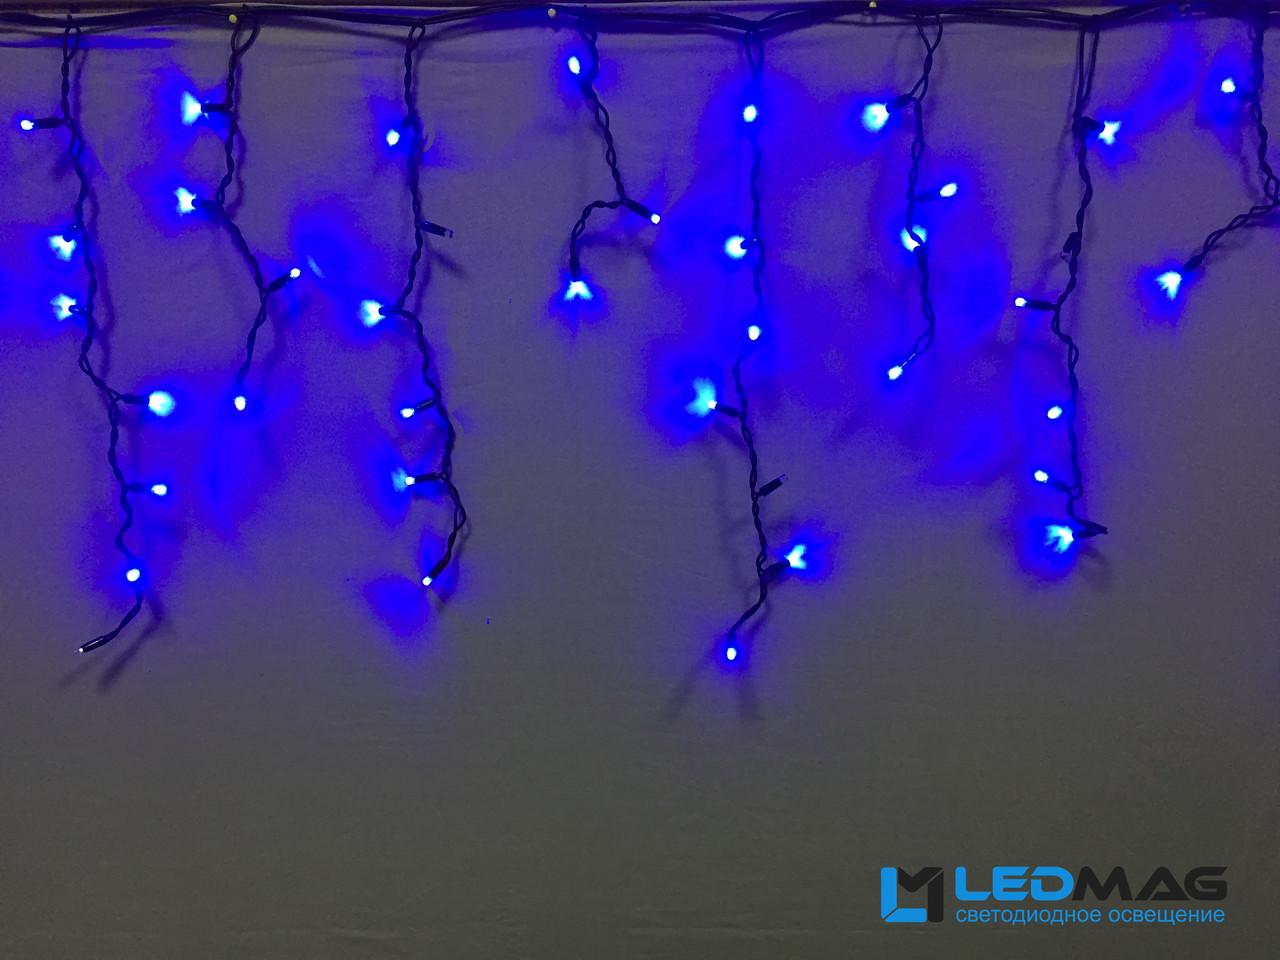 Светодиодная гирлянда уличная Бахрома Flash 3х0.7 м 100LED Каучук Синий